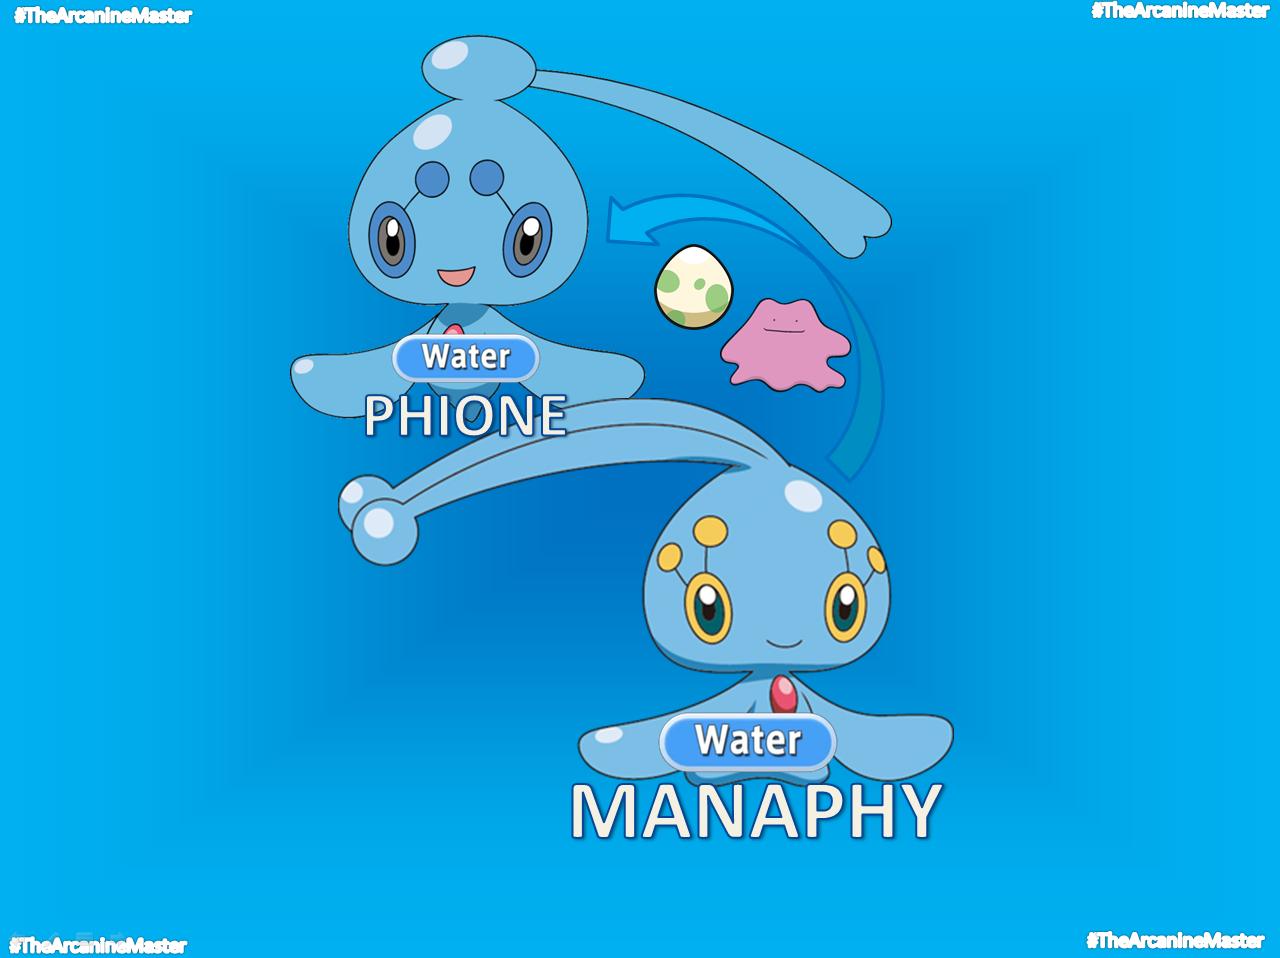 Pokemon picross manaphy images pokemon images for Mural 01 pokemon picross